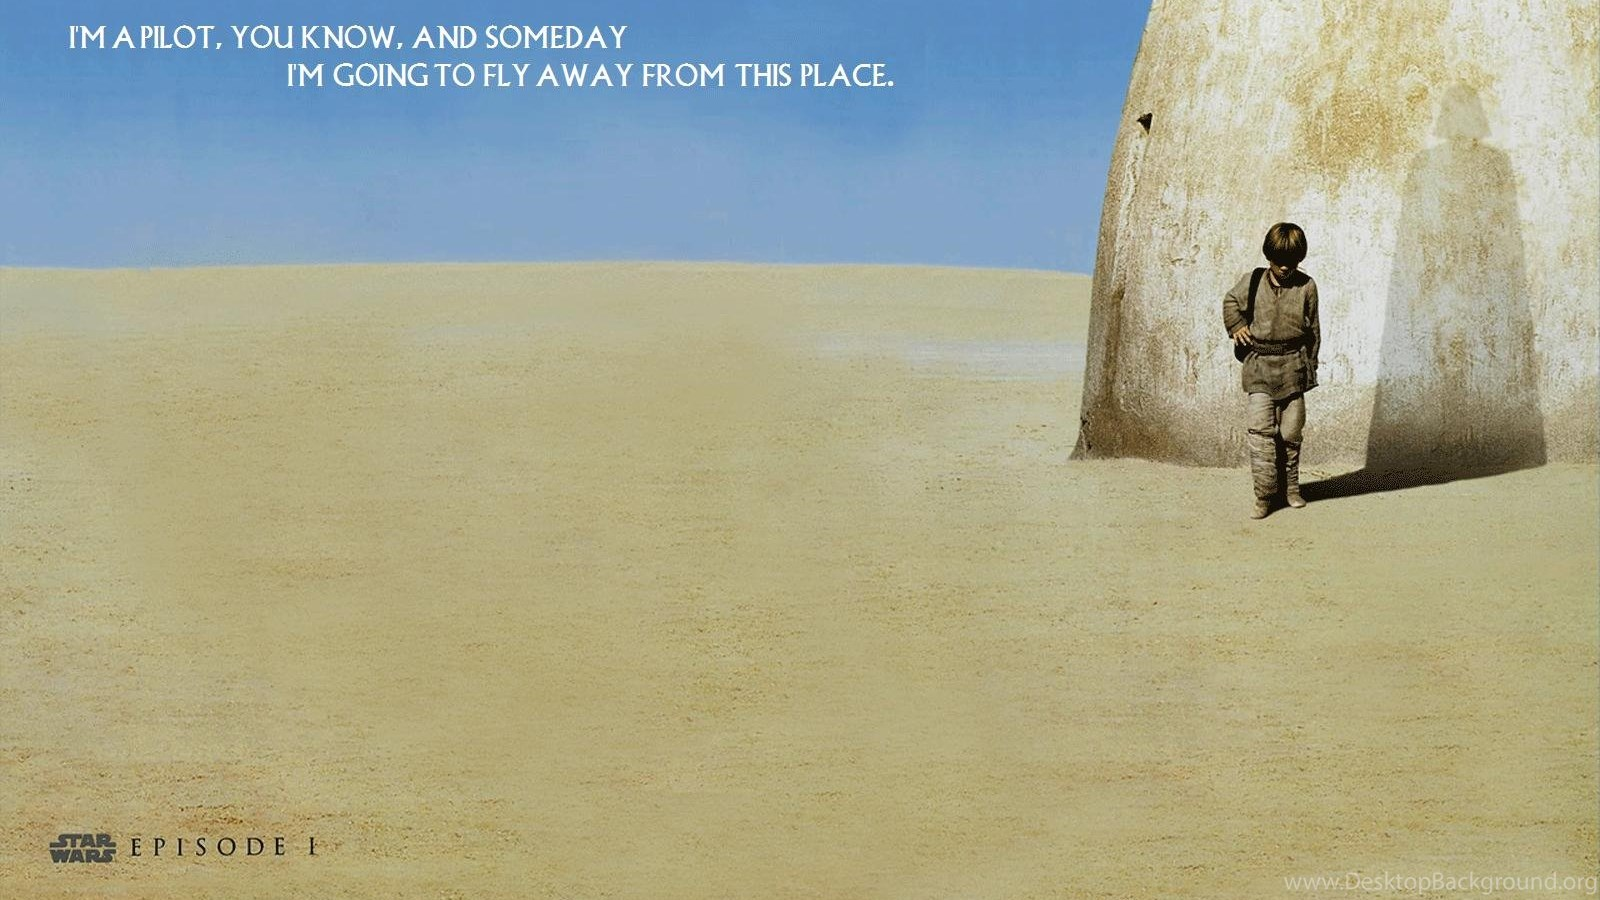 Star Wars Episode 1 Poster Wallpapers Album On Imgur Desktop